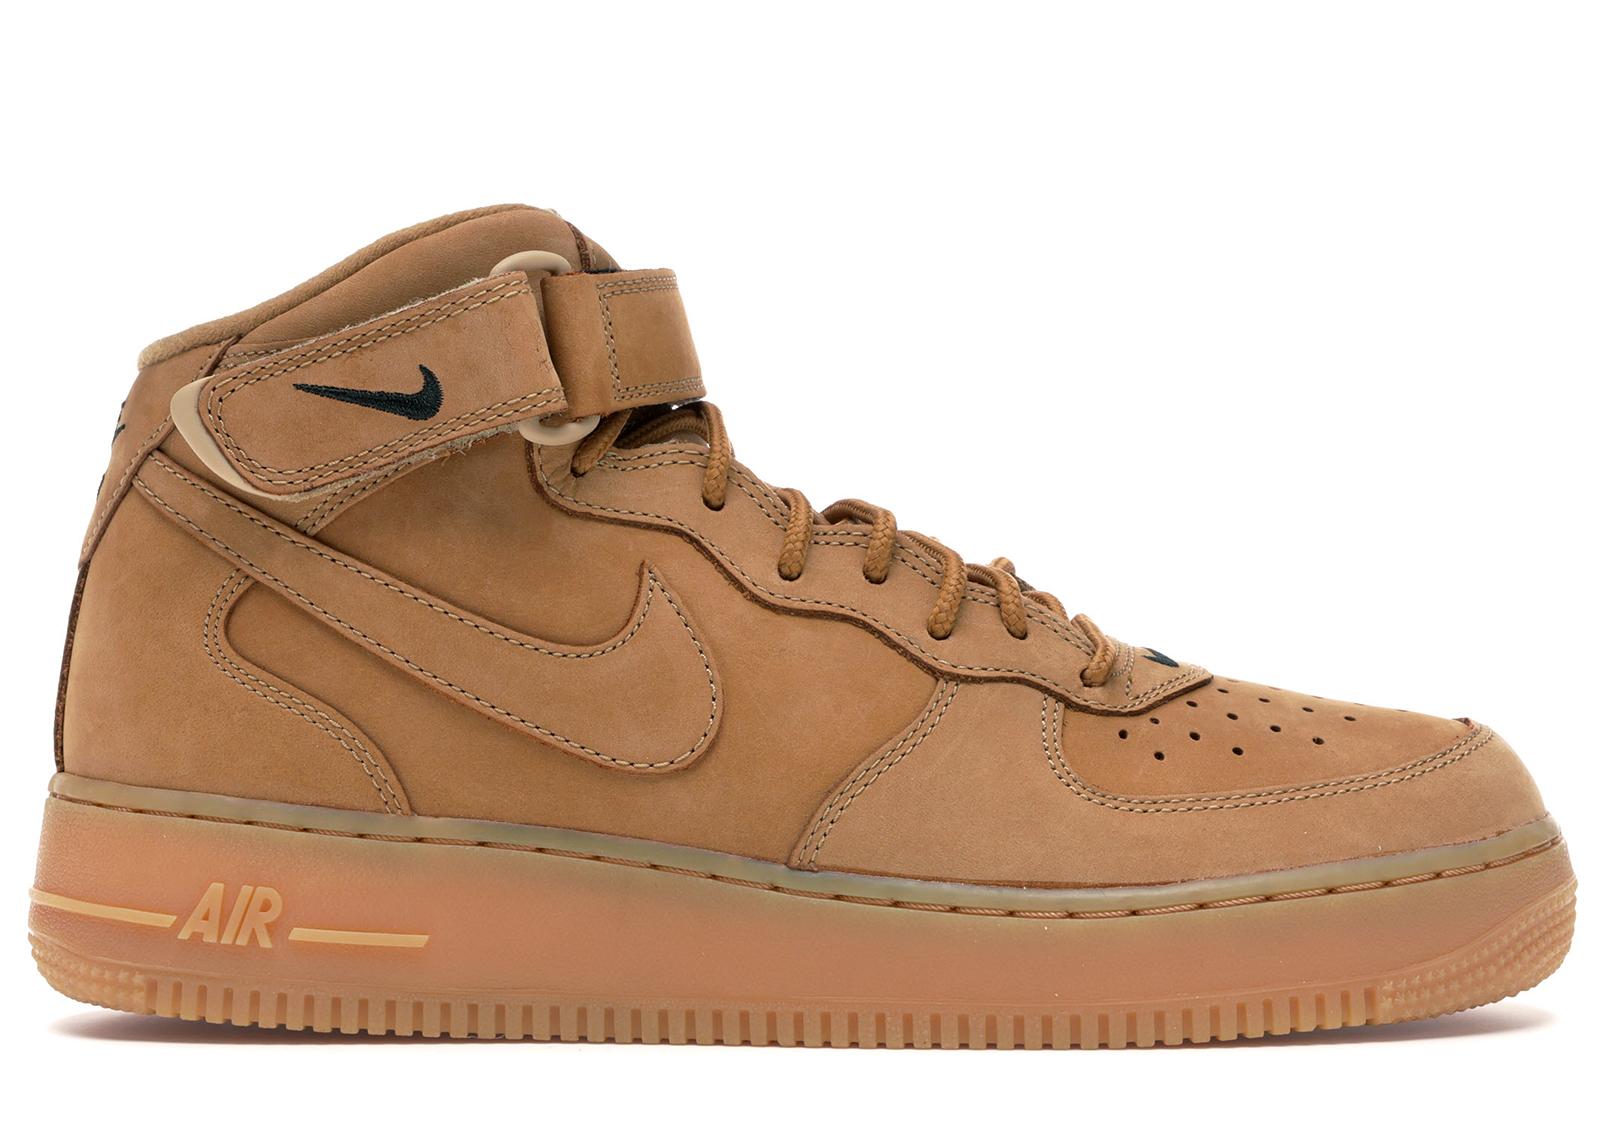 Nike Air Force 1 Mid Flax (2014)